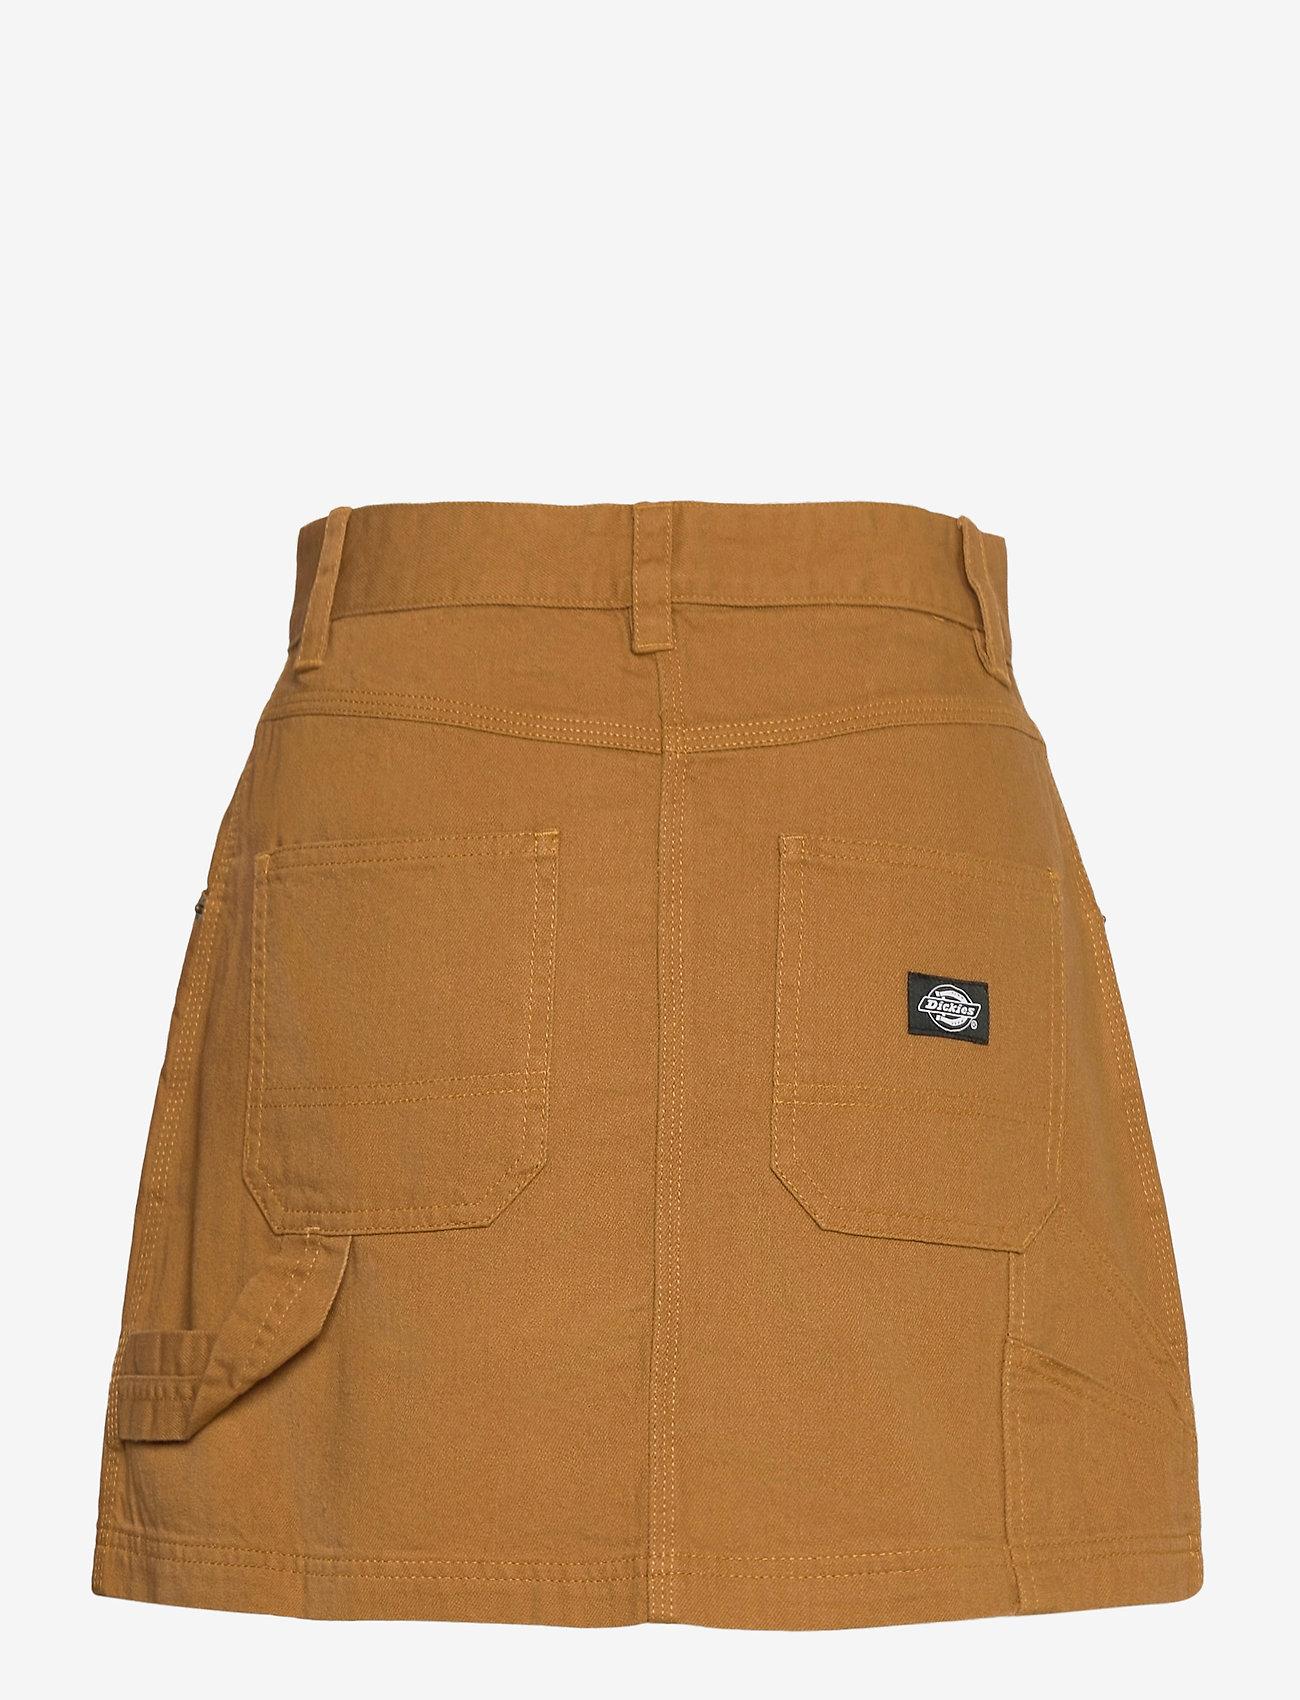 Dickies - SHONGALOO - jeanskjolar - brown duck - 1